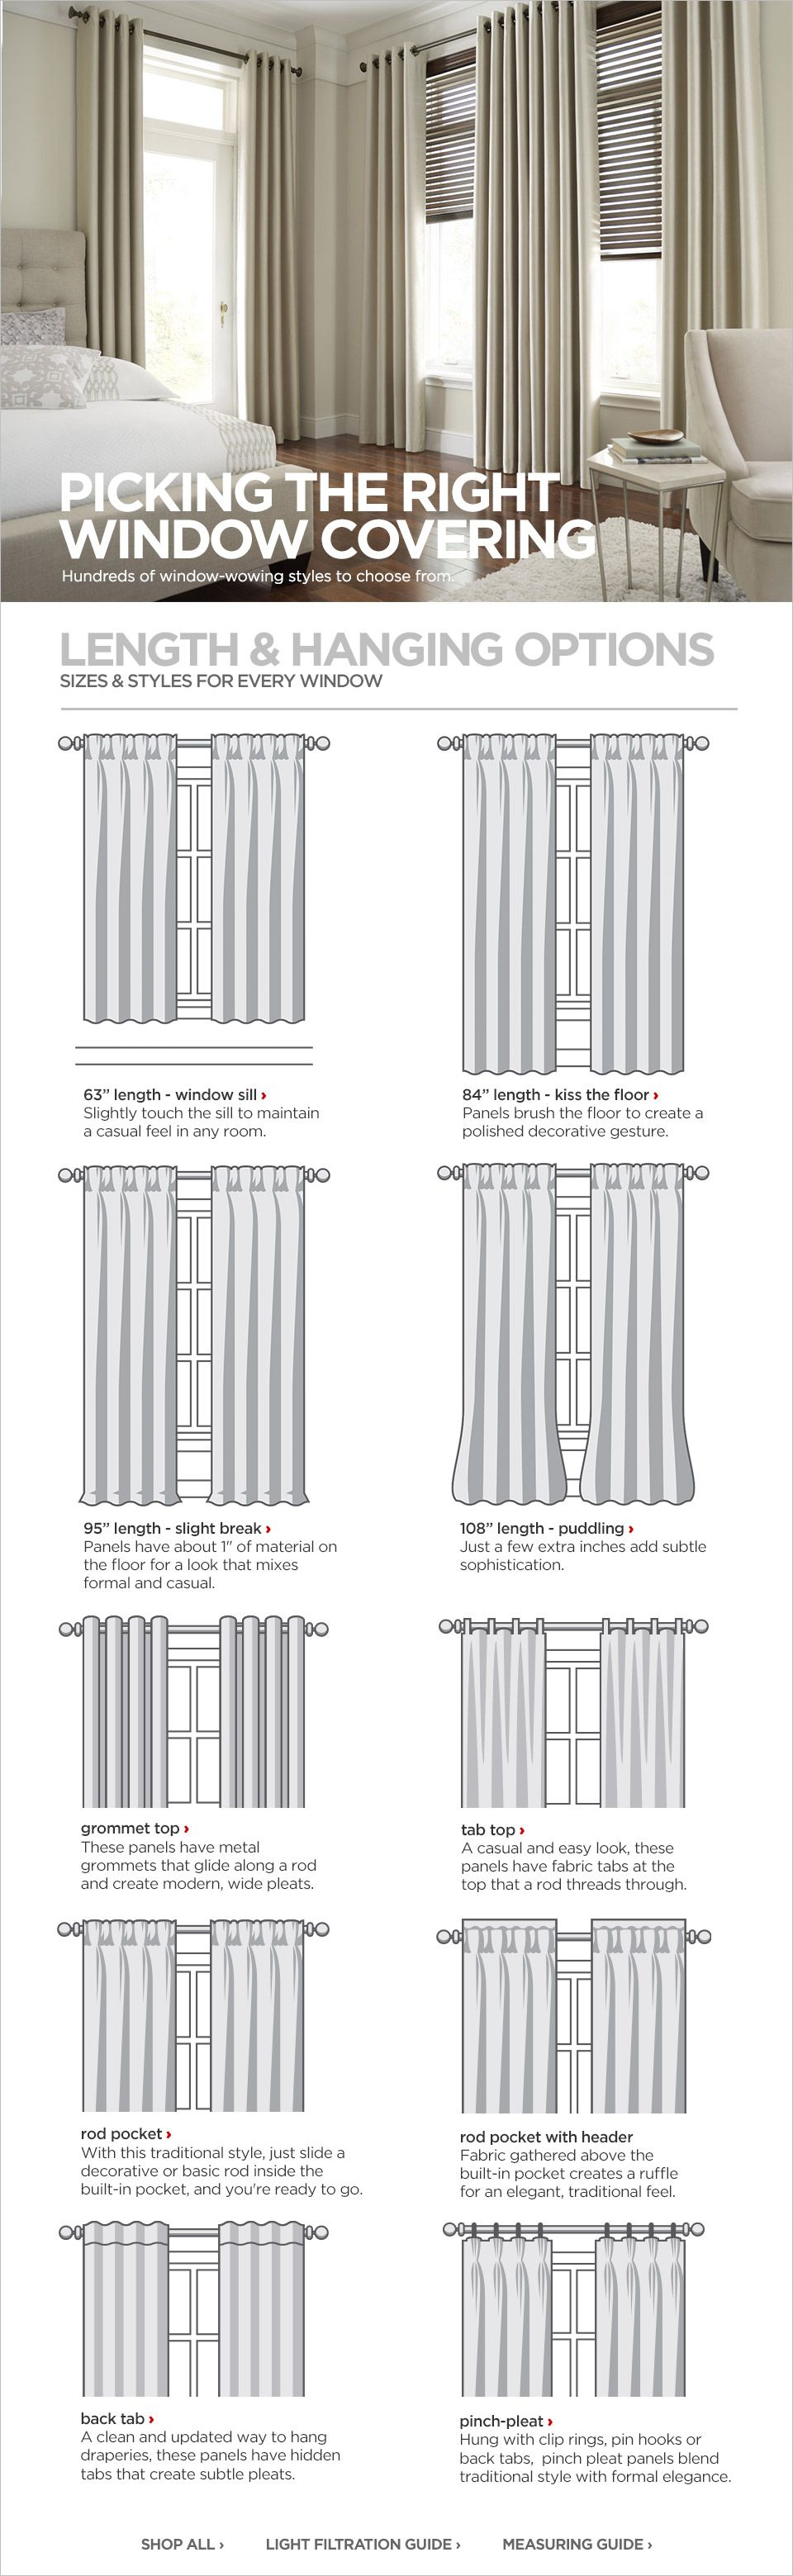 21 curtain ideas curtains with blinds